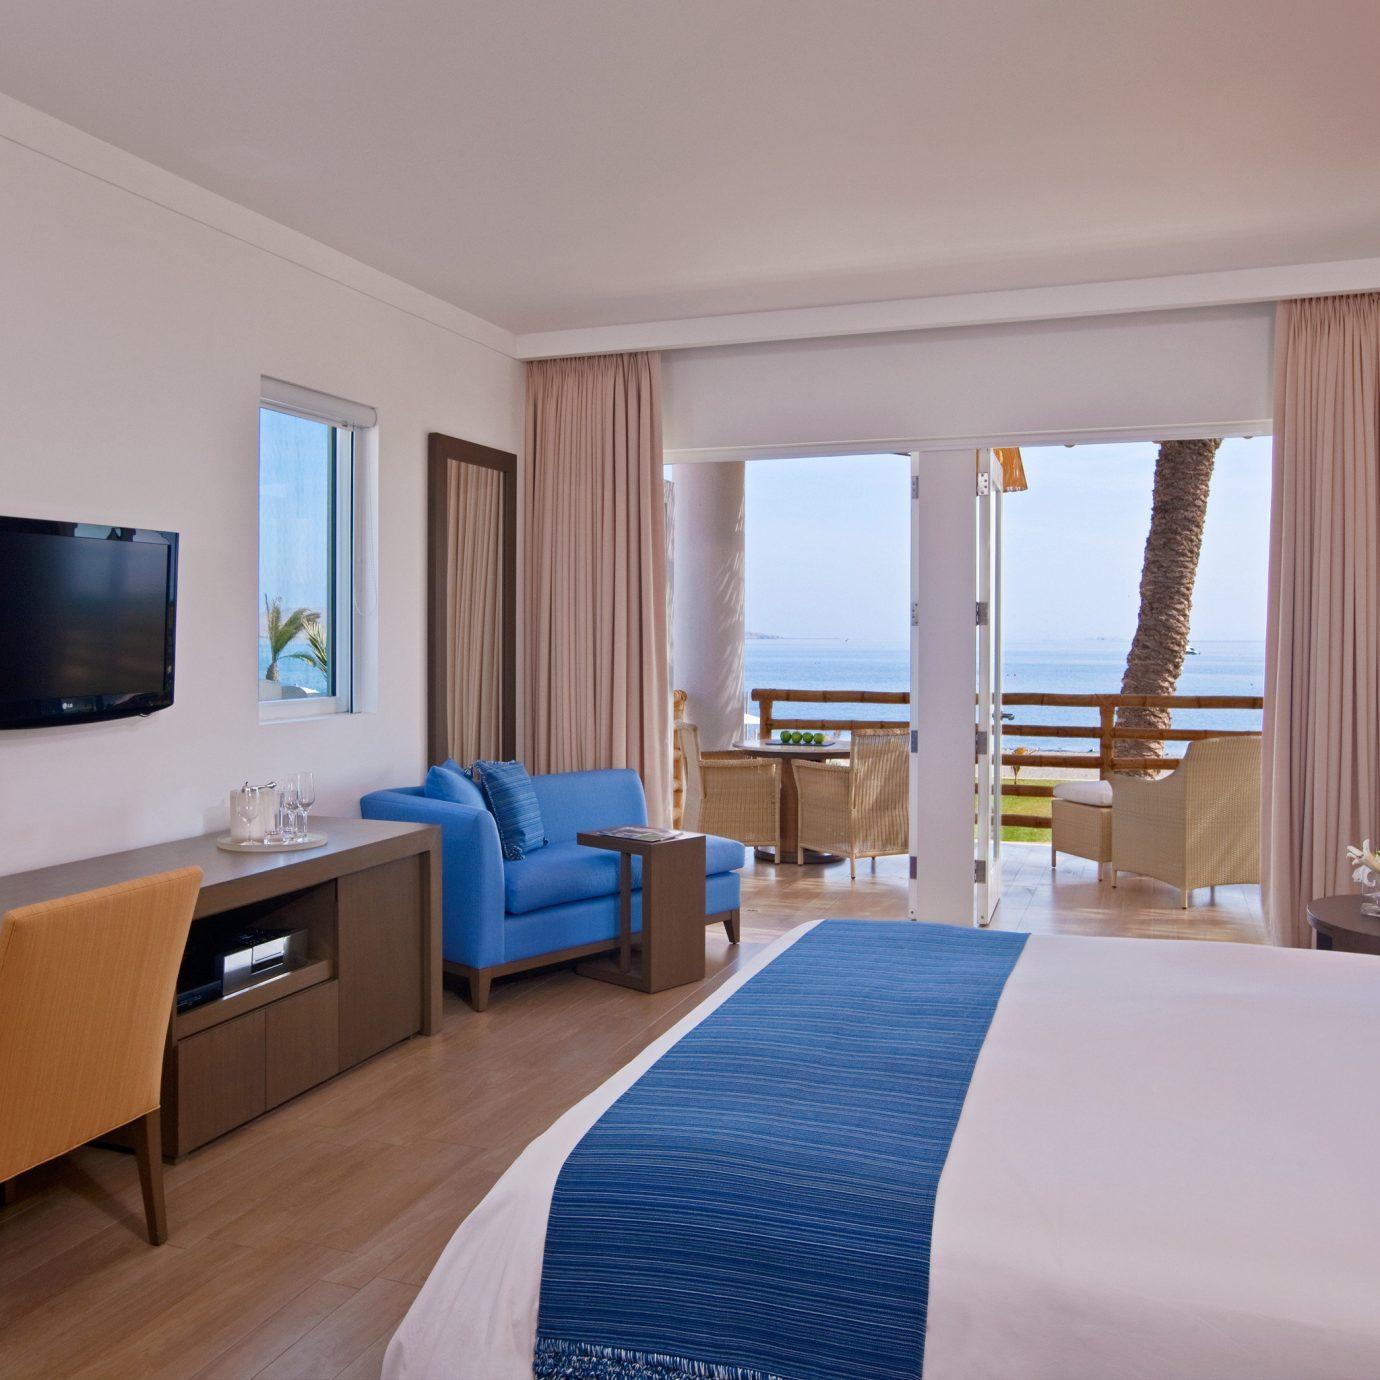 Balcony Bedroom Family Luxury Resort Scenic views property Suite condominium cottage Villa living room flat